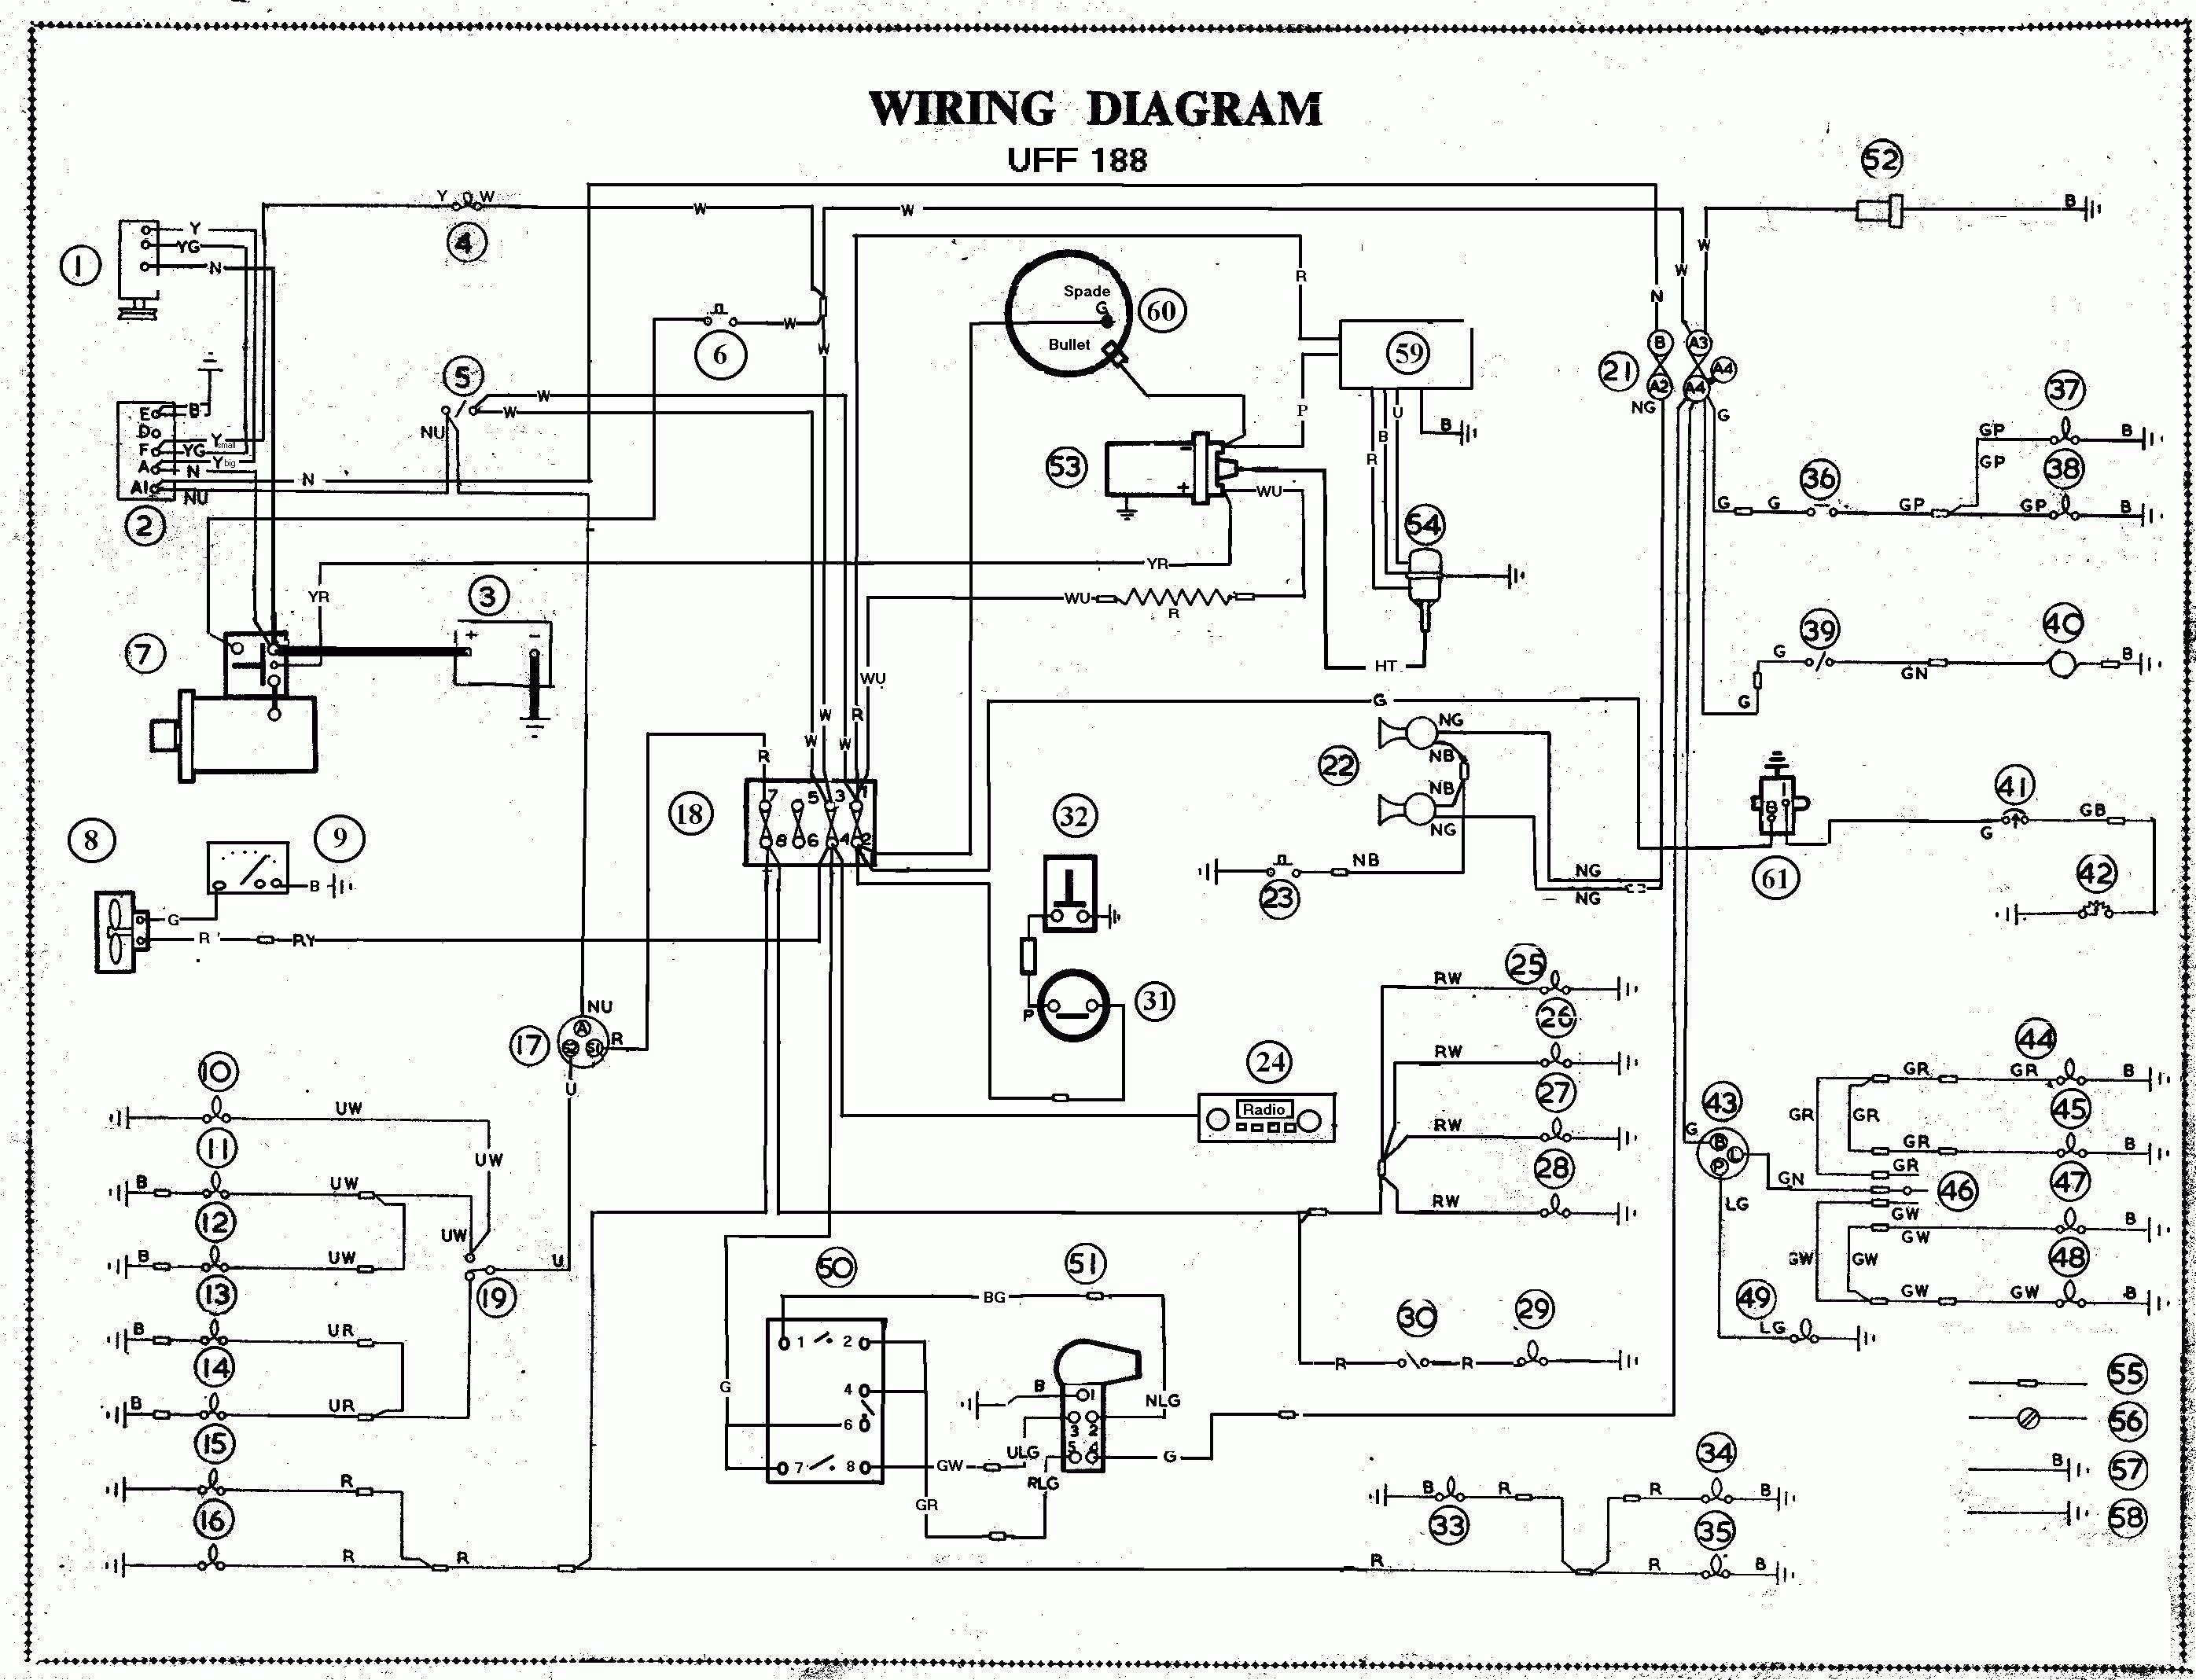 Wiring Diagram Symbols Legend Electrical Diagram Diagram Design Electrical Wiring Diagram